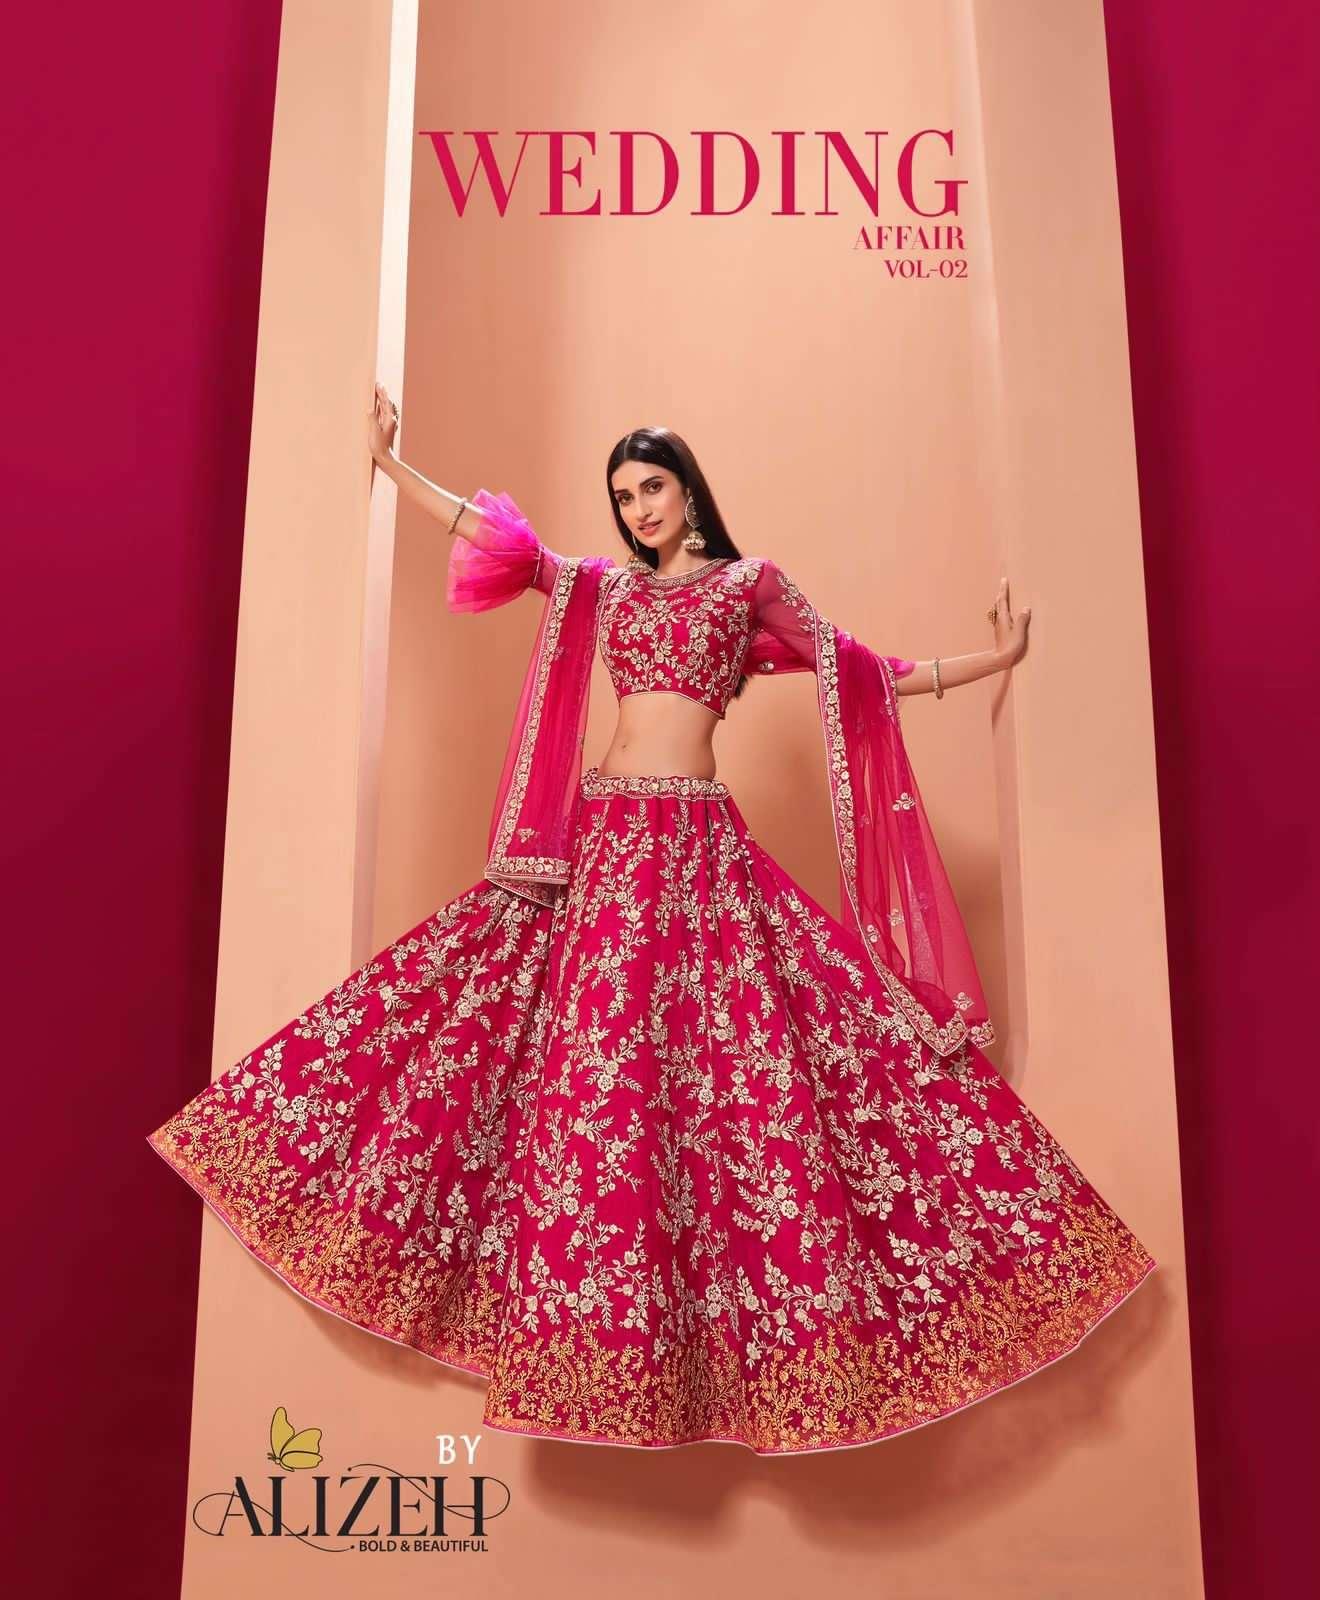 alizeh wedding affair vol 2 1035-1038 series stunning bridal lehenga collection